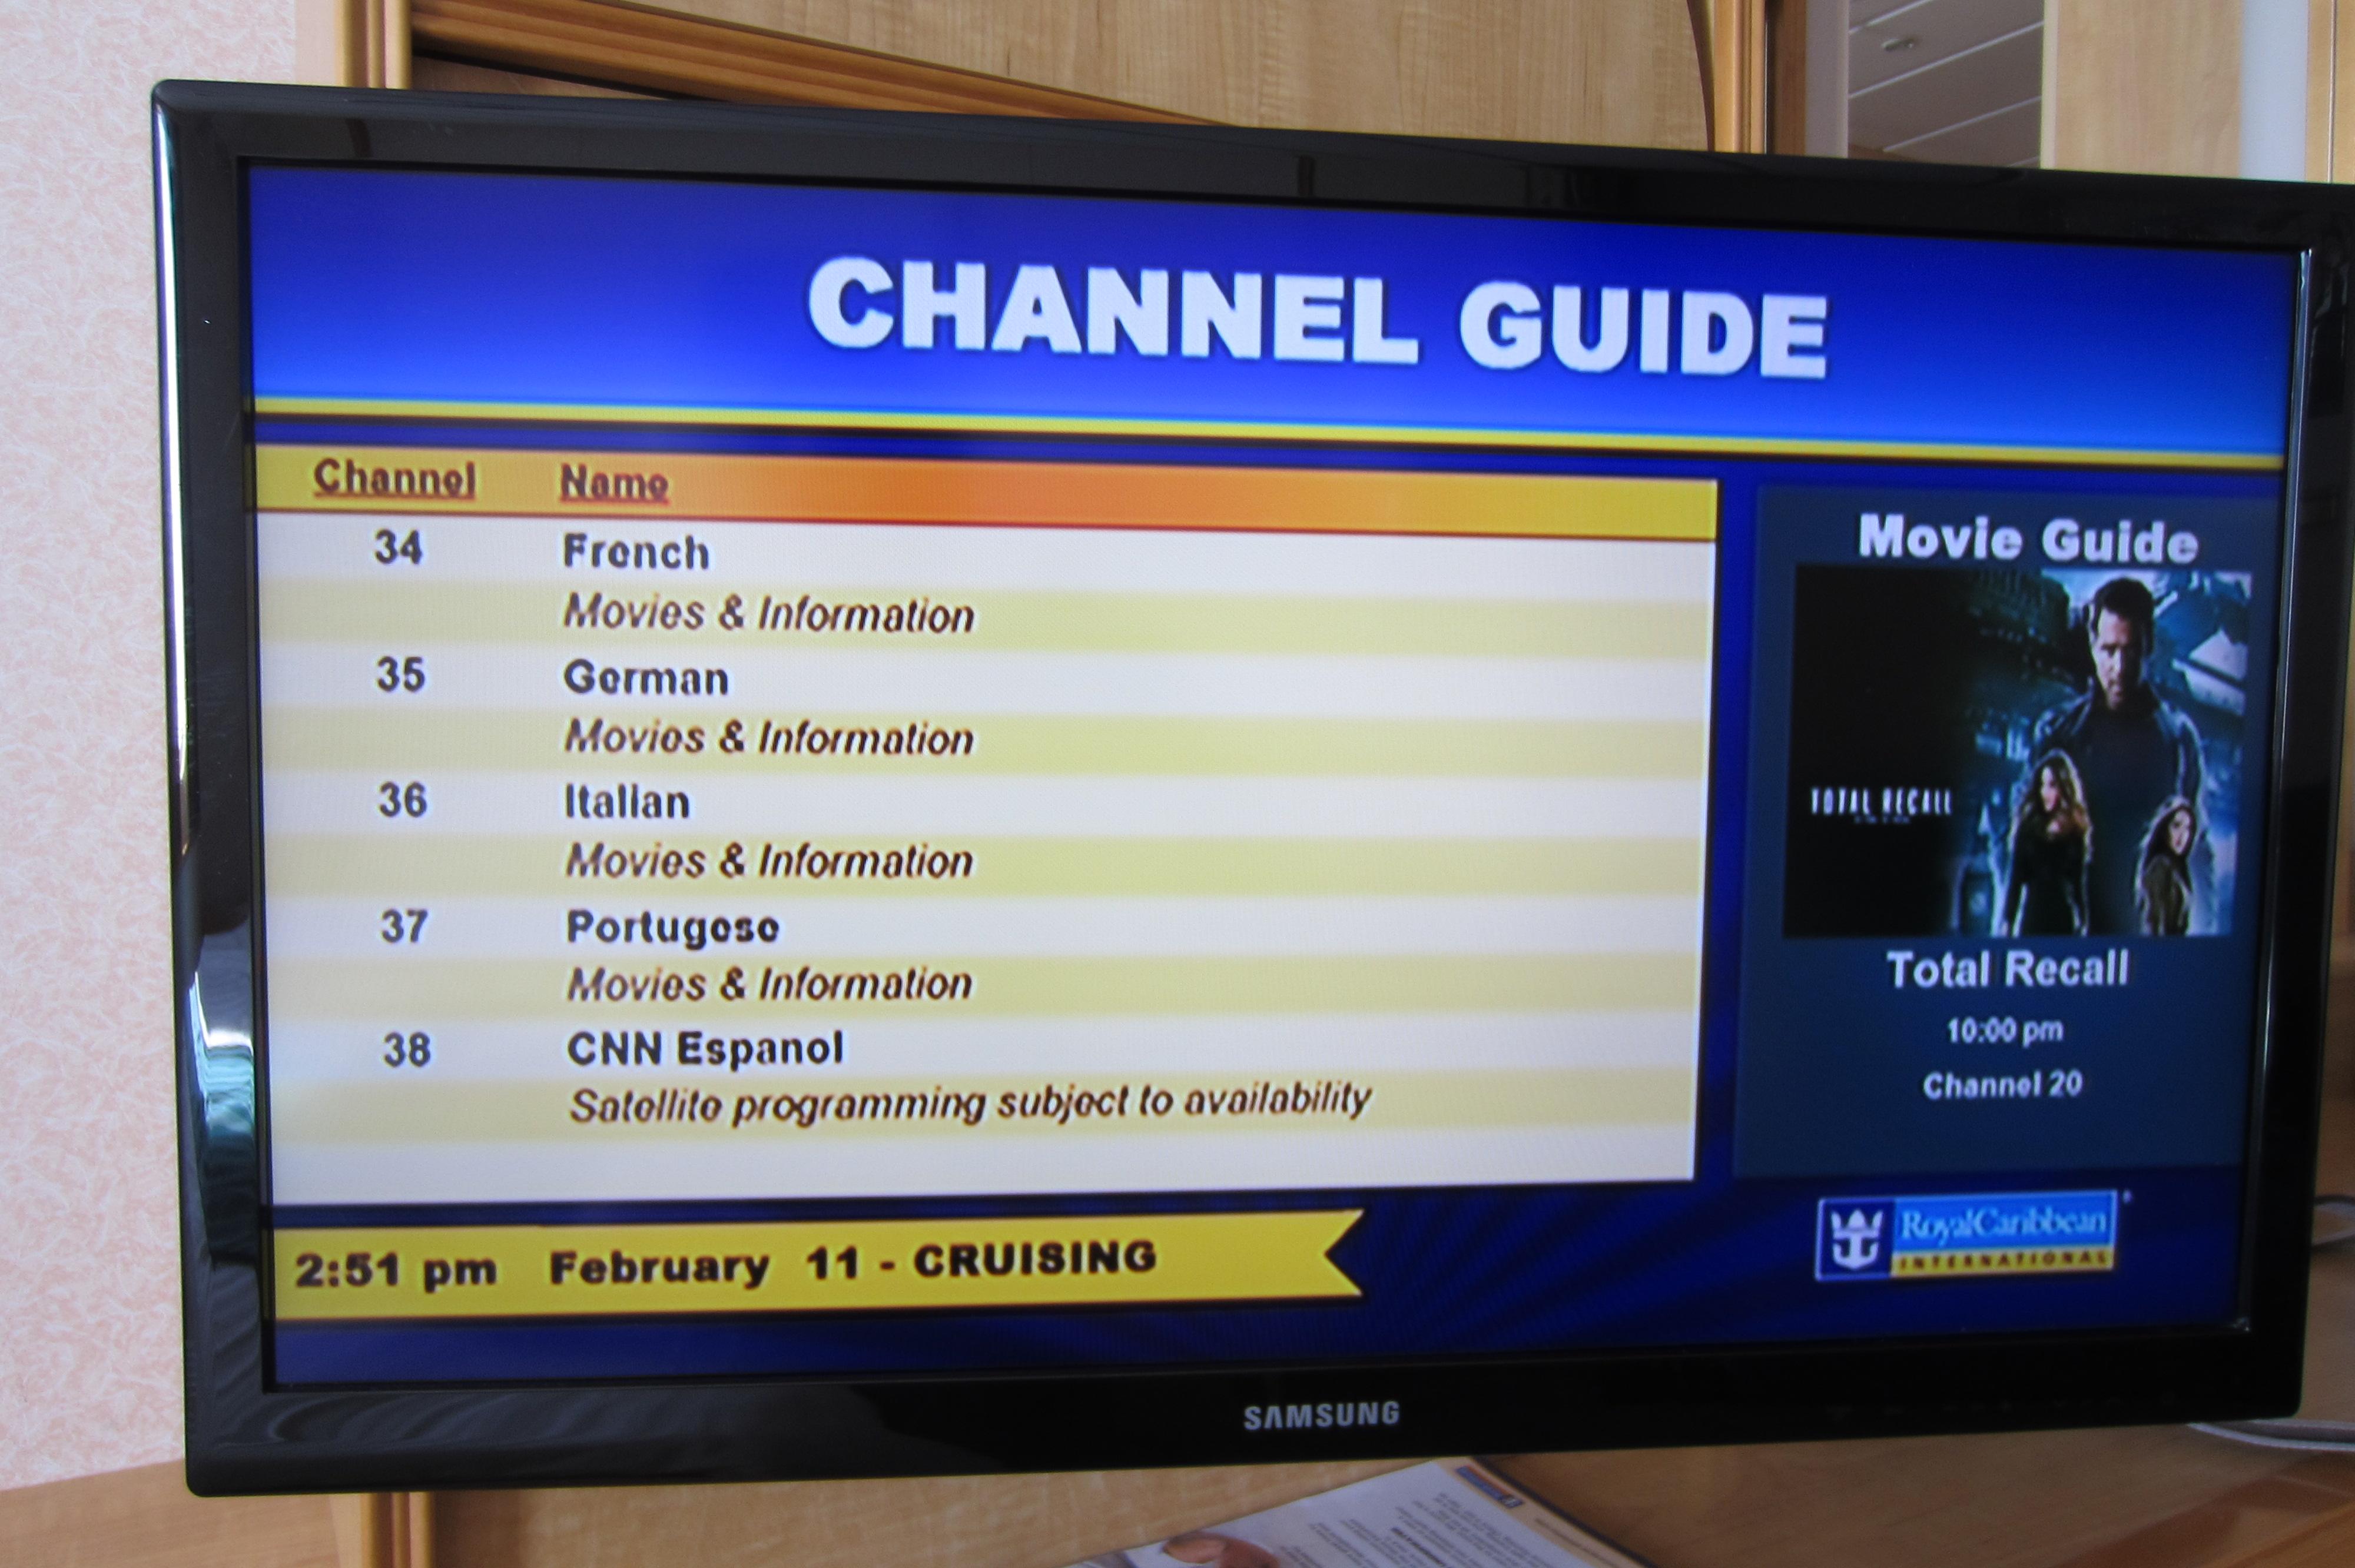 Cruise Ship TV Channels  Galveston Cruise Tips